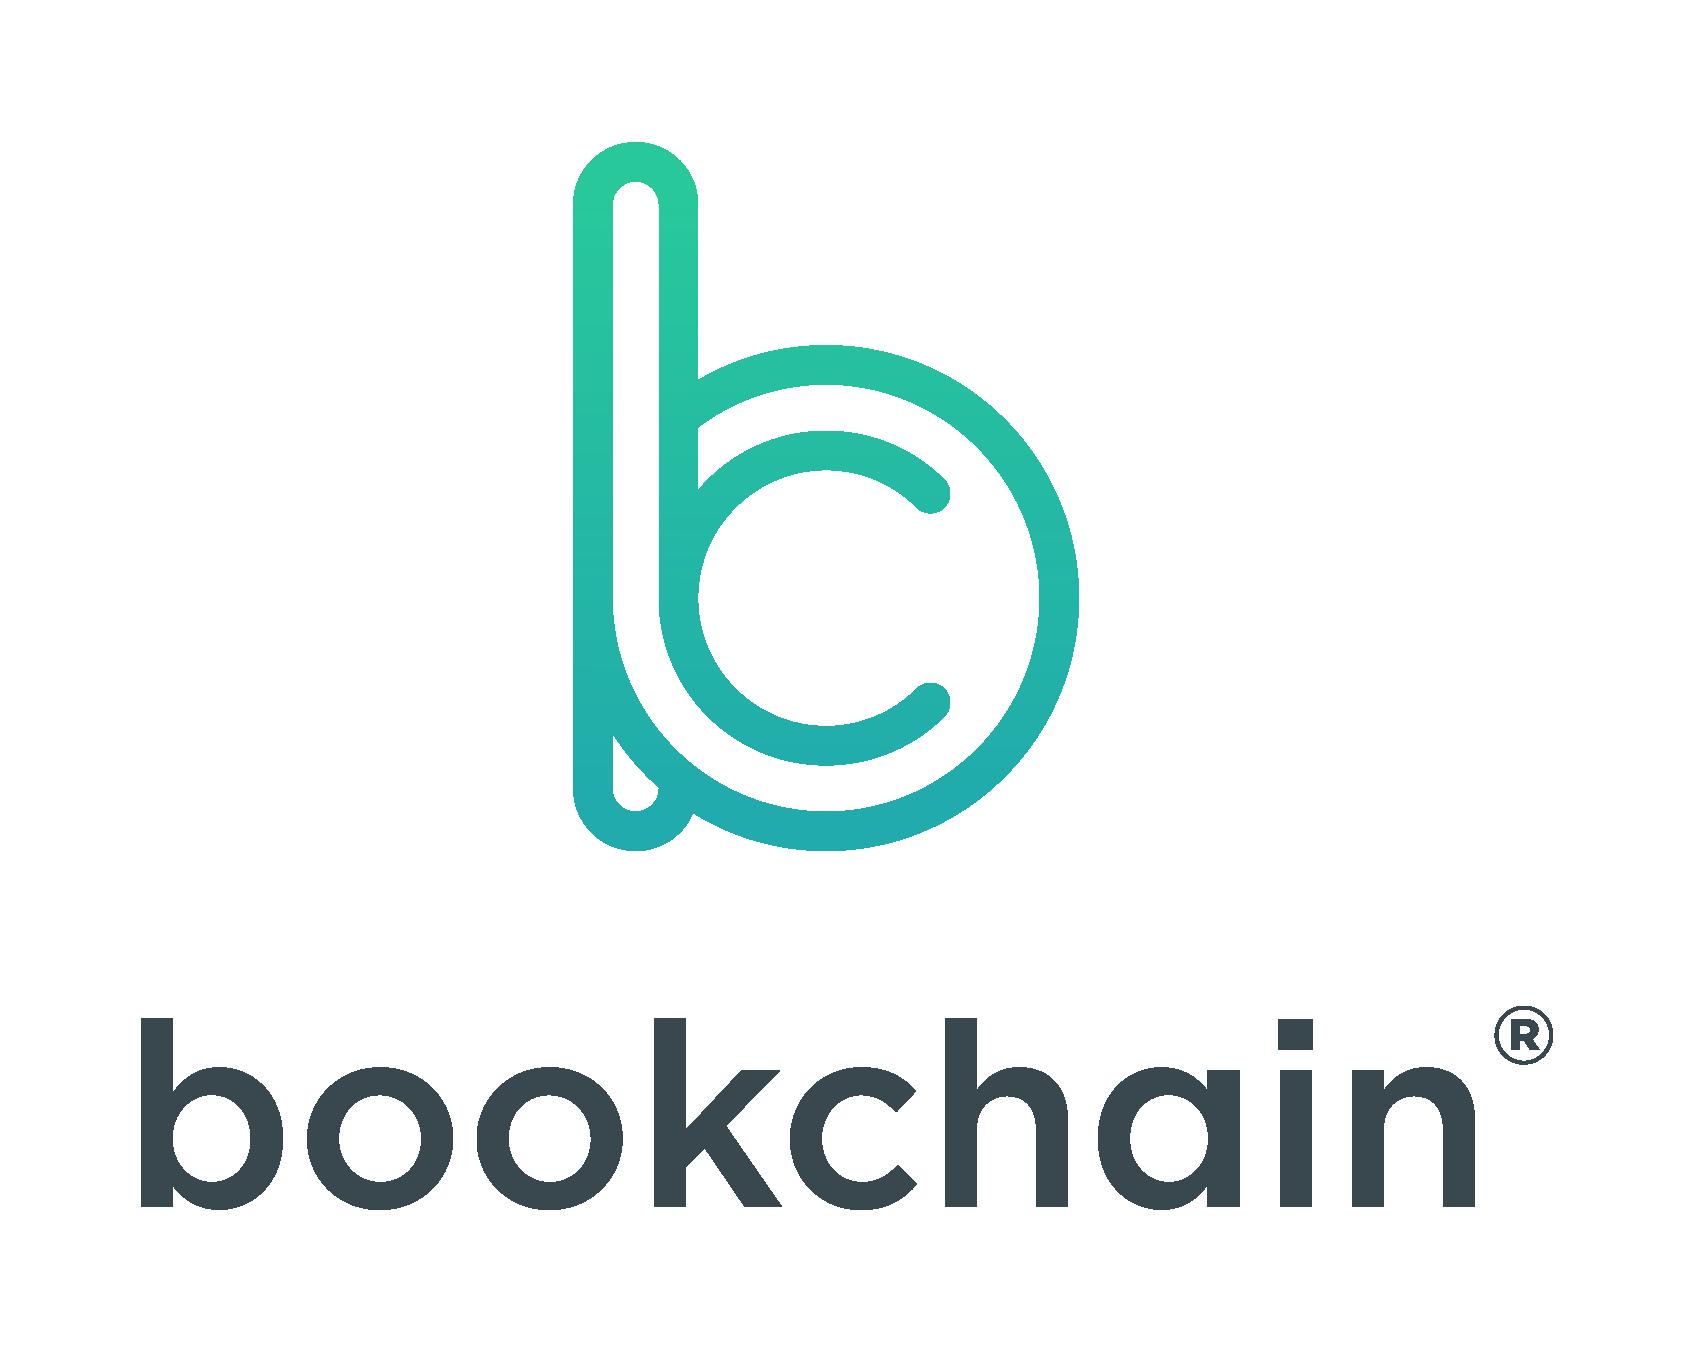 bookchain logo